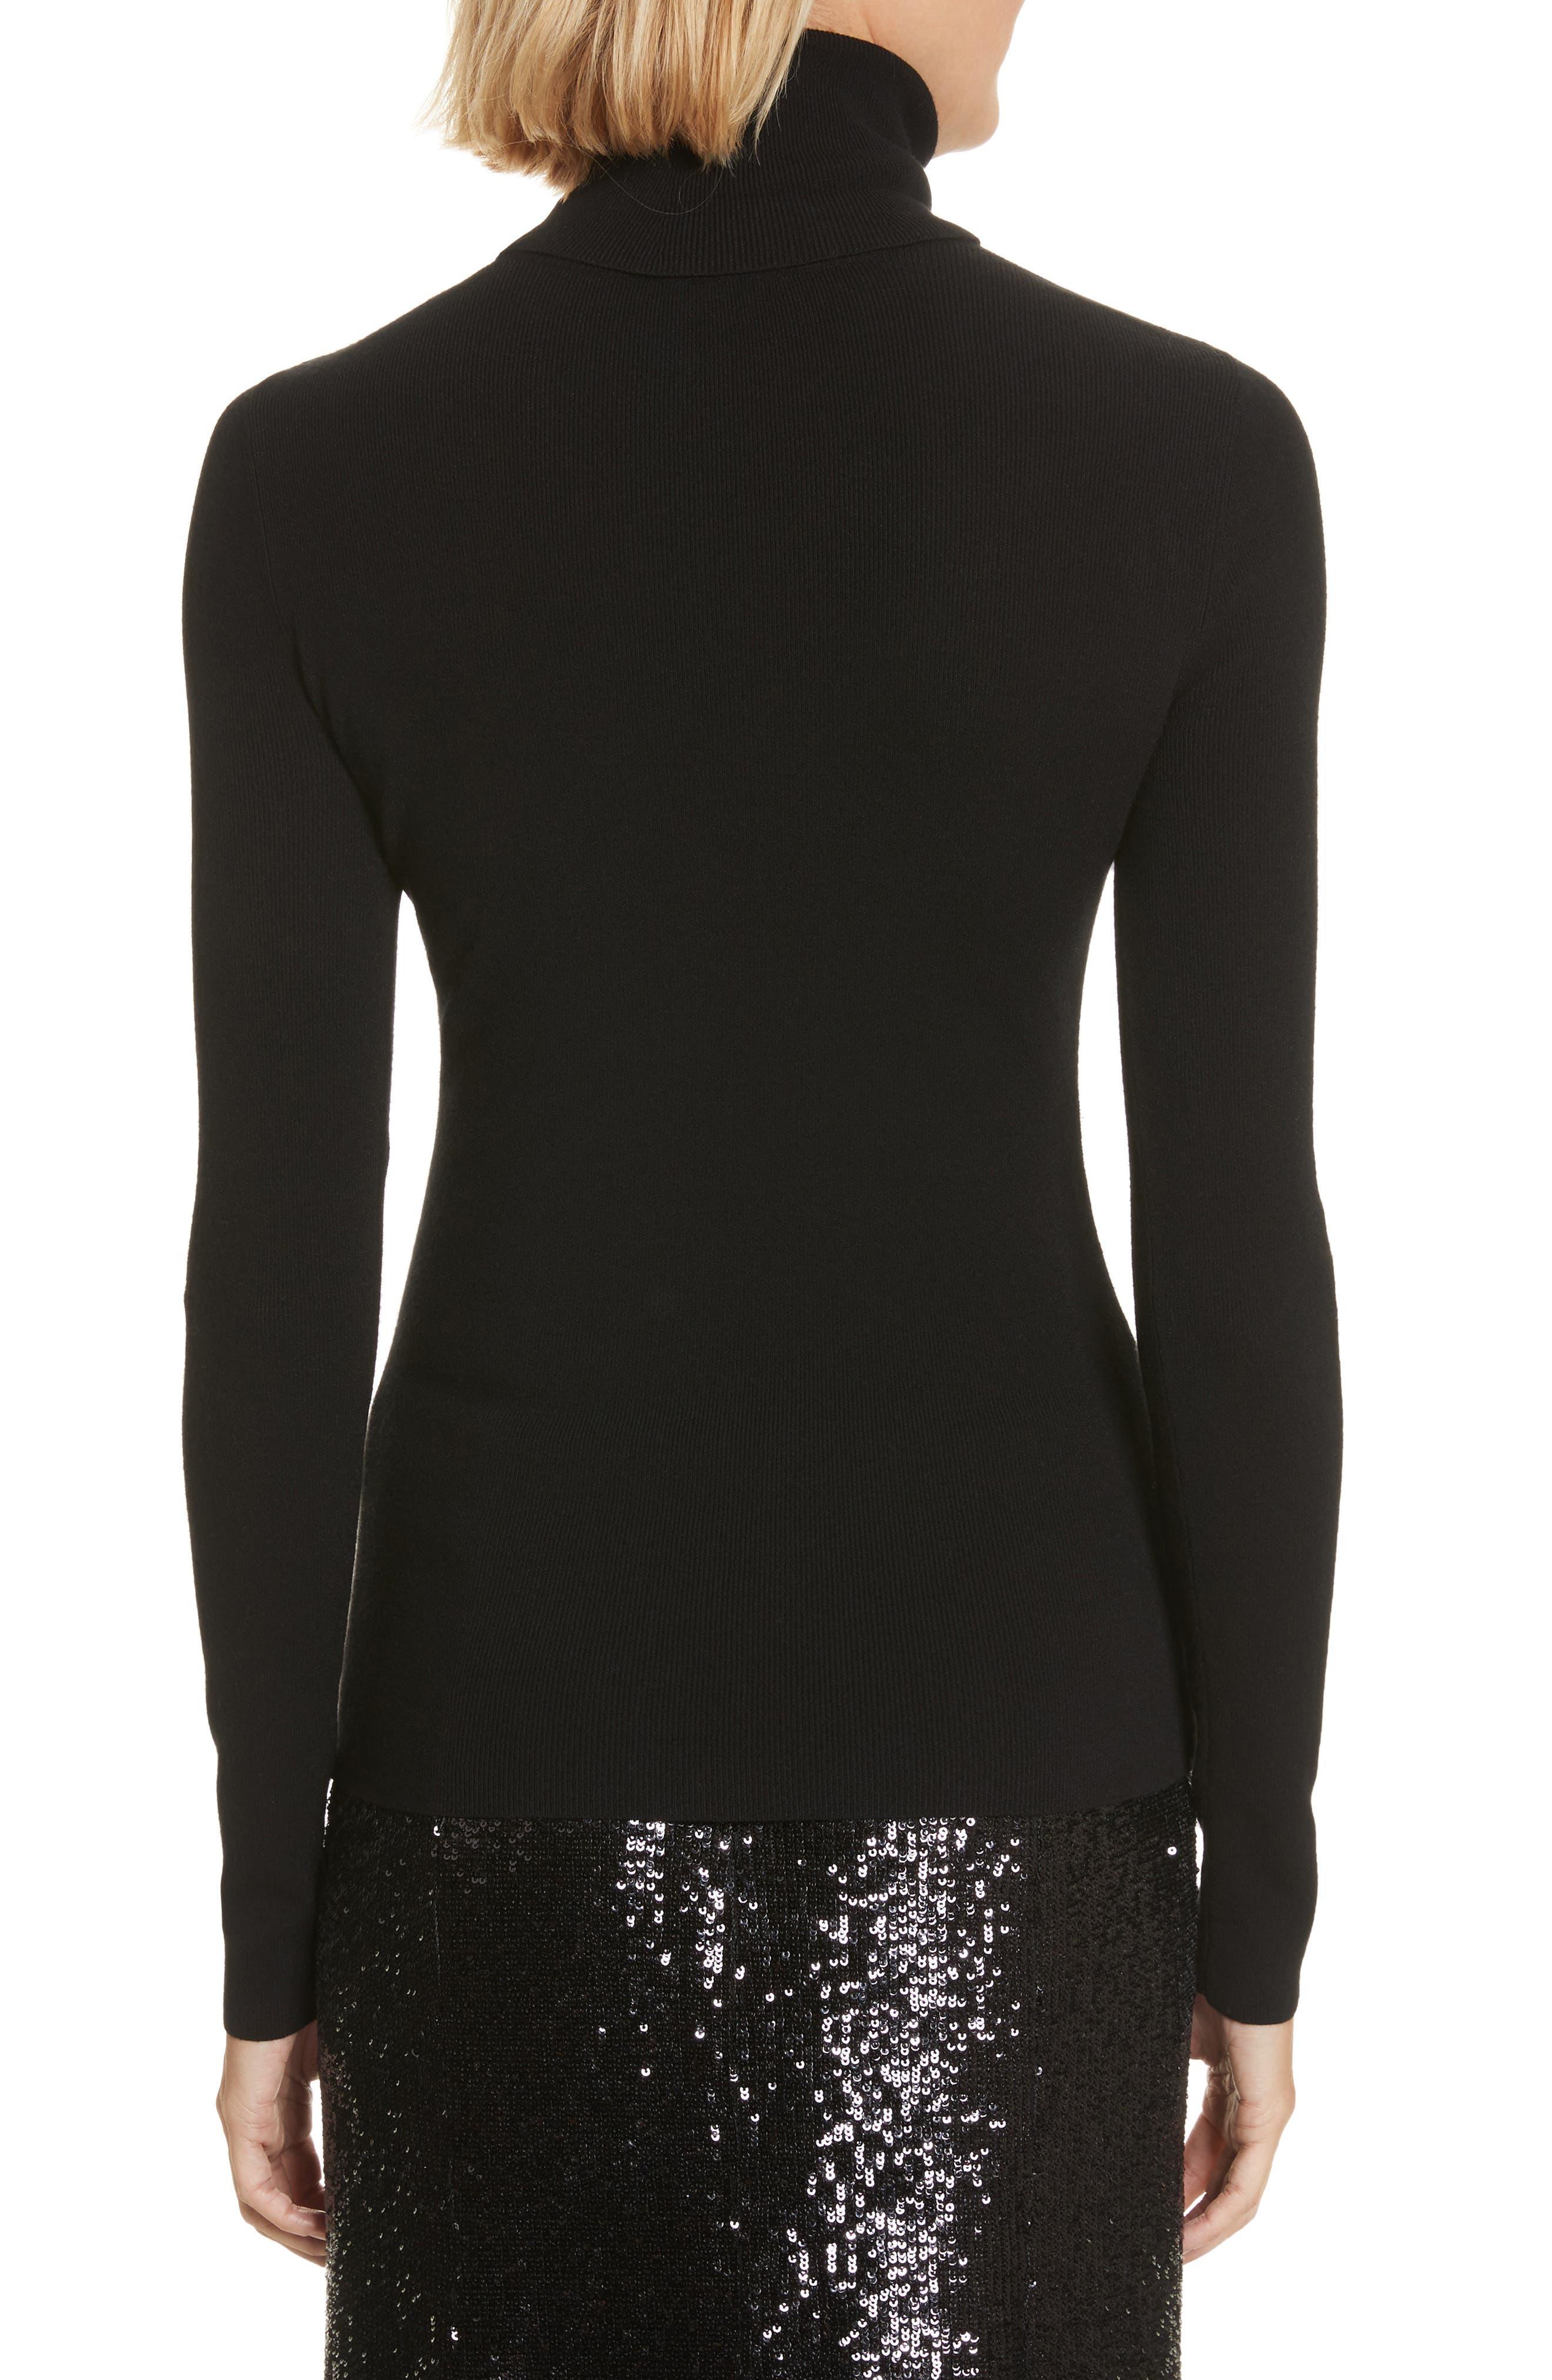 Camden Cutout Turtleneck Sweater,                             Alternate thumbnail 2, color,                             Black